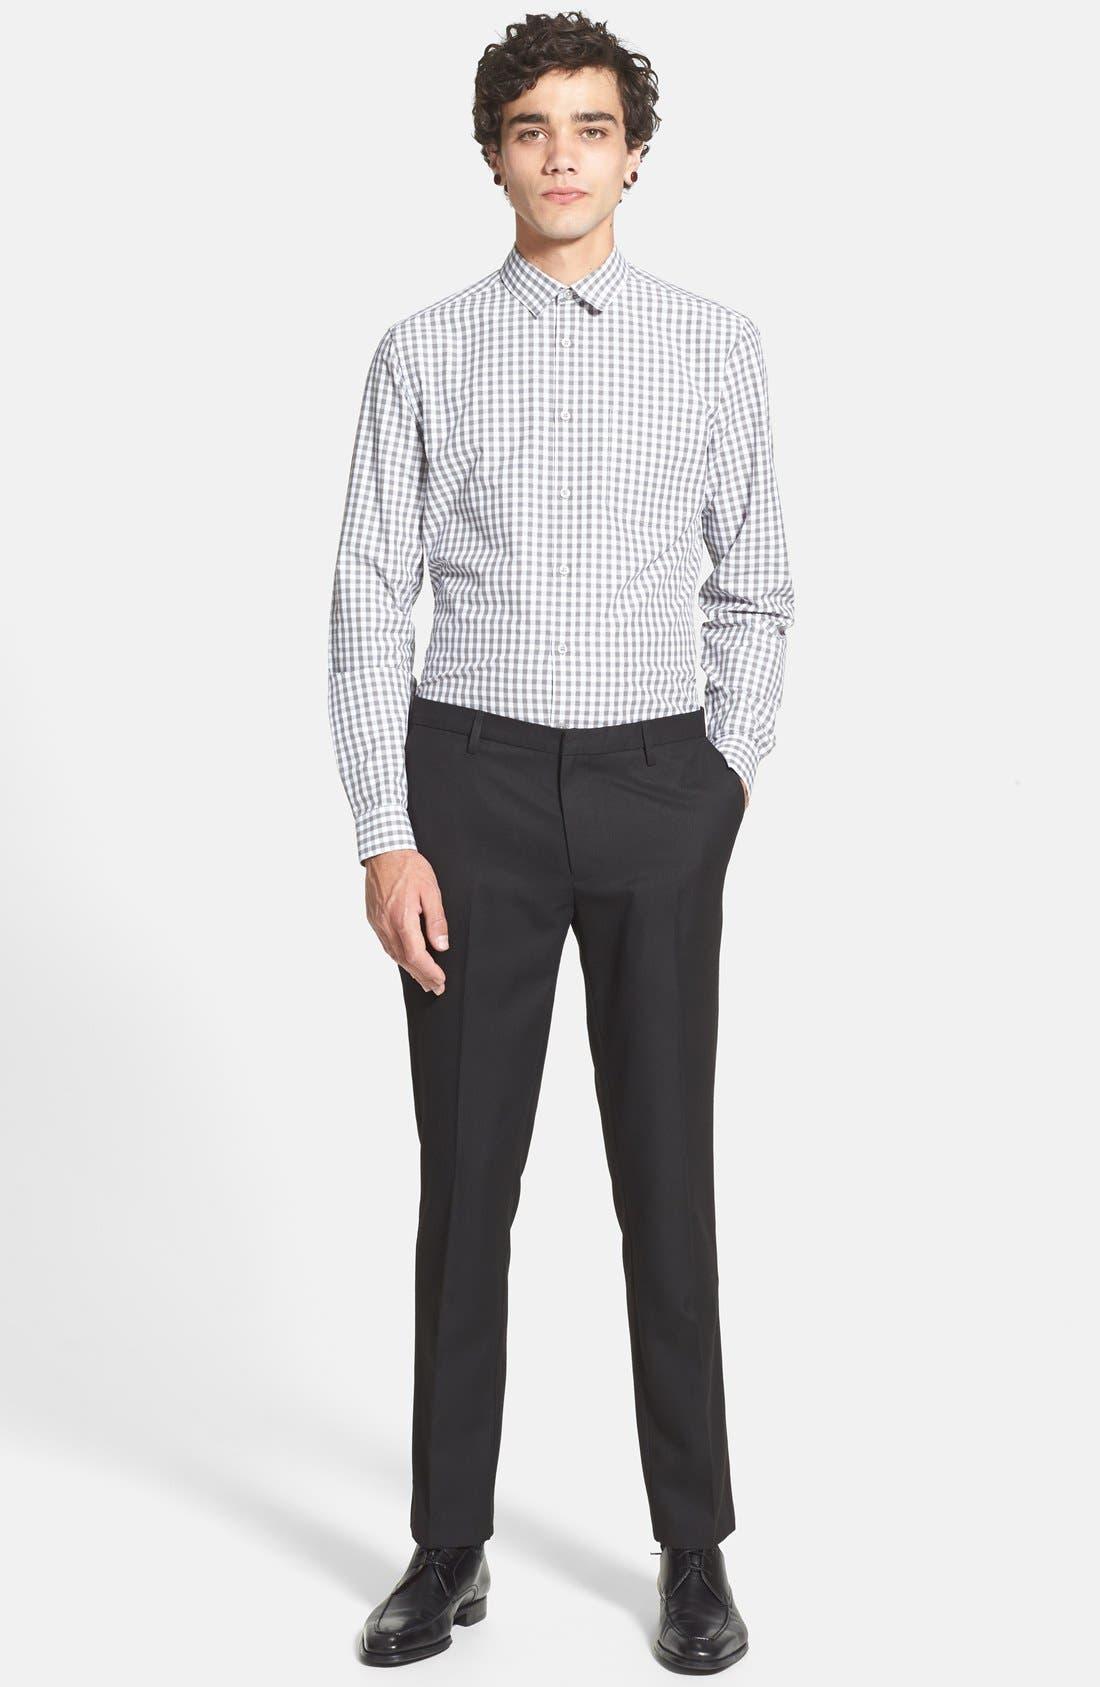 TOPMAN, Skinny Fit Cotton Flannel Trousers, Alternate thumbnail 5, color, 001